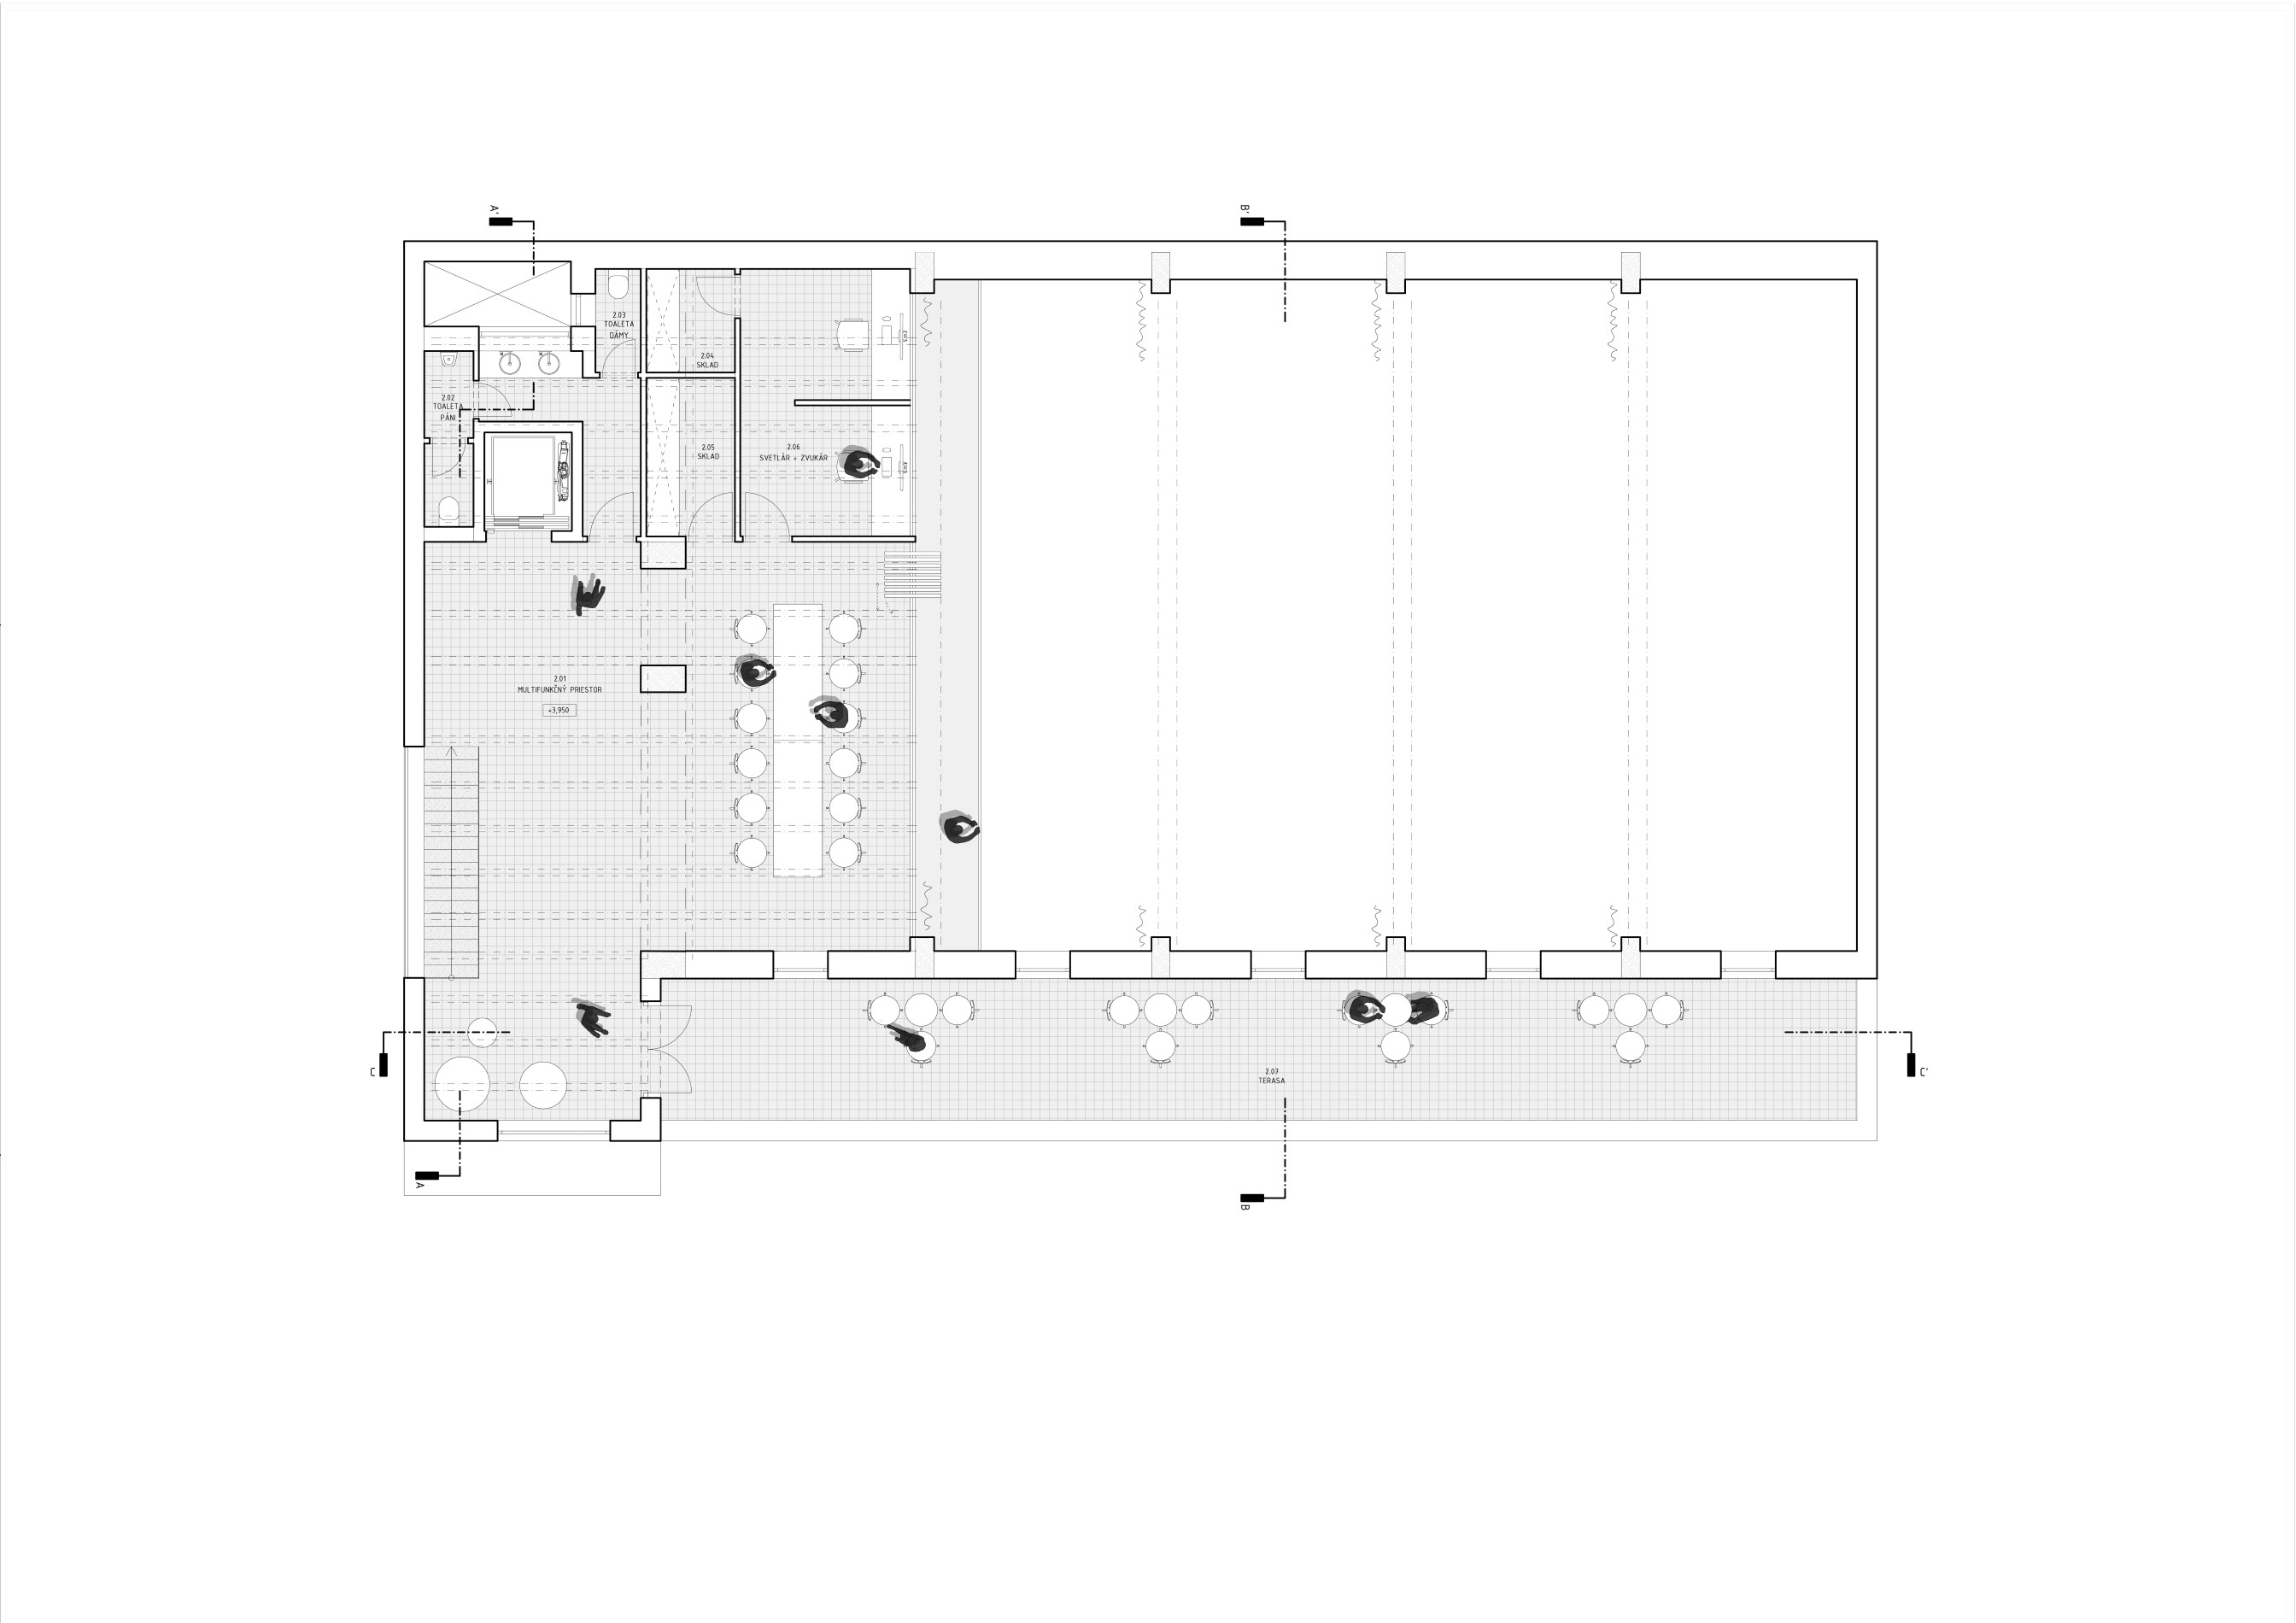 KINO-PALACE-NITRA_JURAJ-HUBINSKY_02-NP.jpg